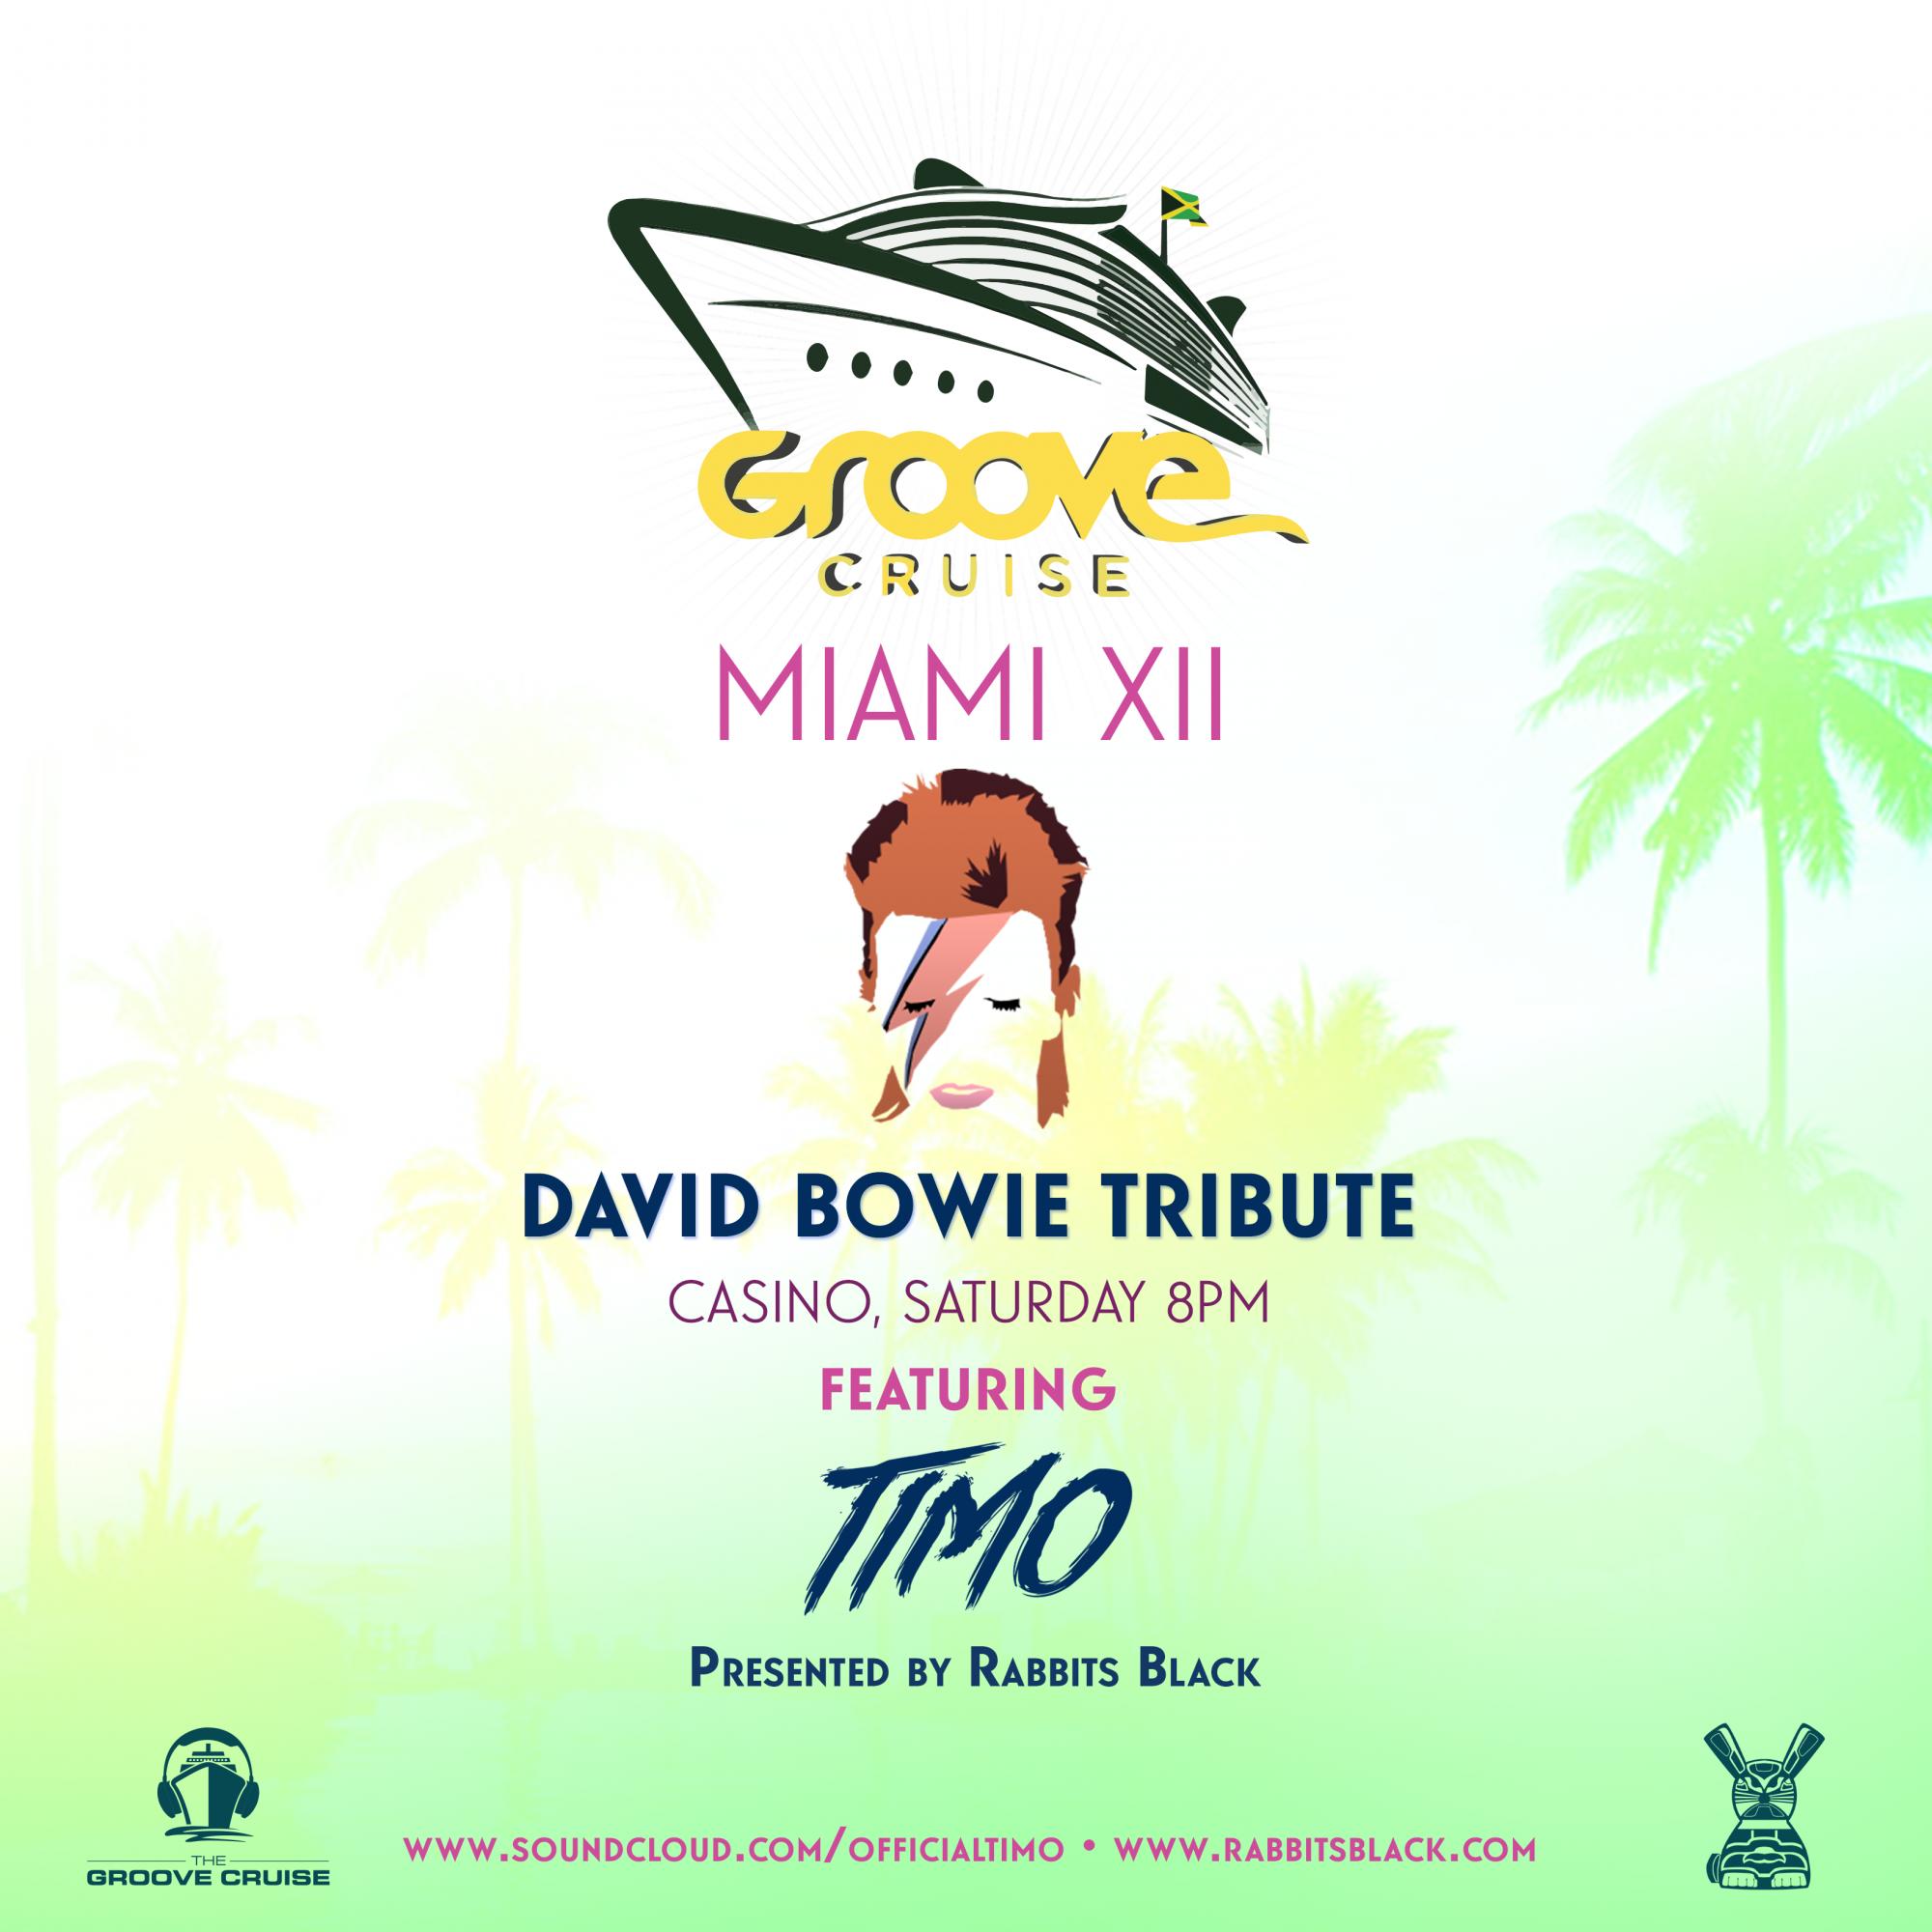 Groove-Cruise-Miami-Davie-Bowie-TIMO